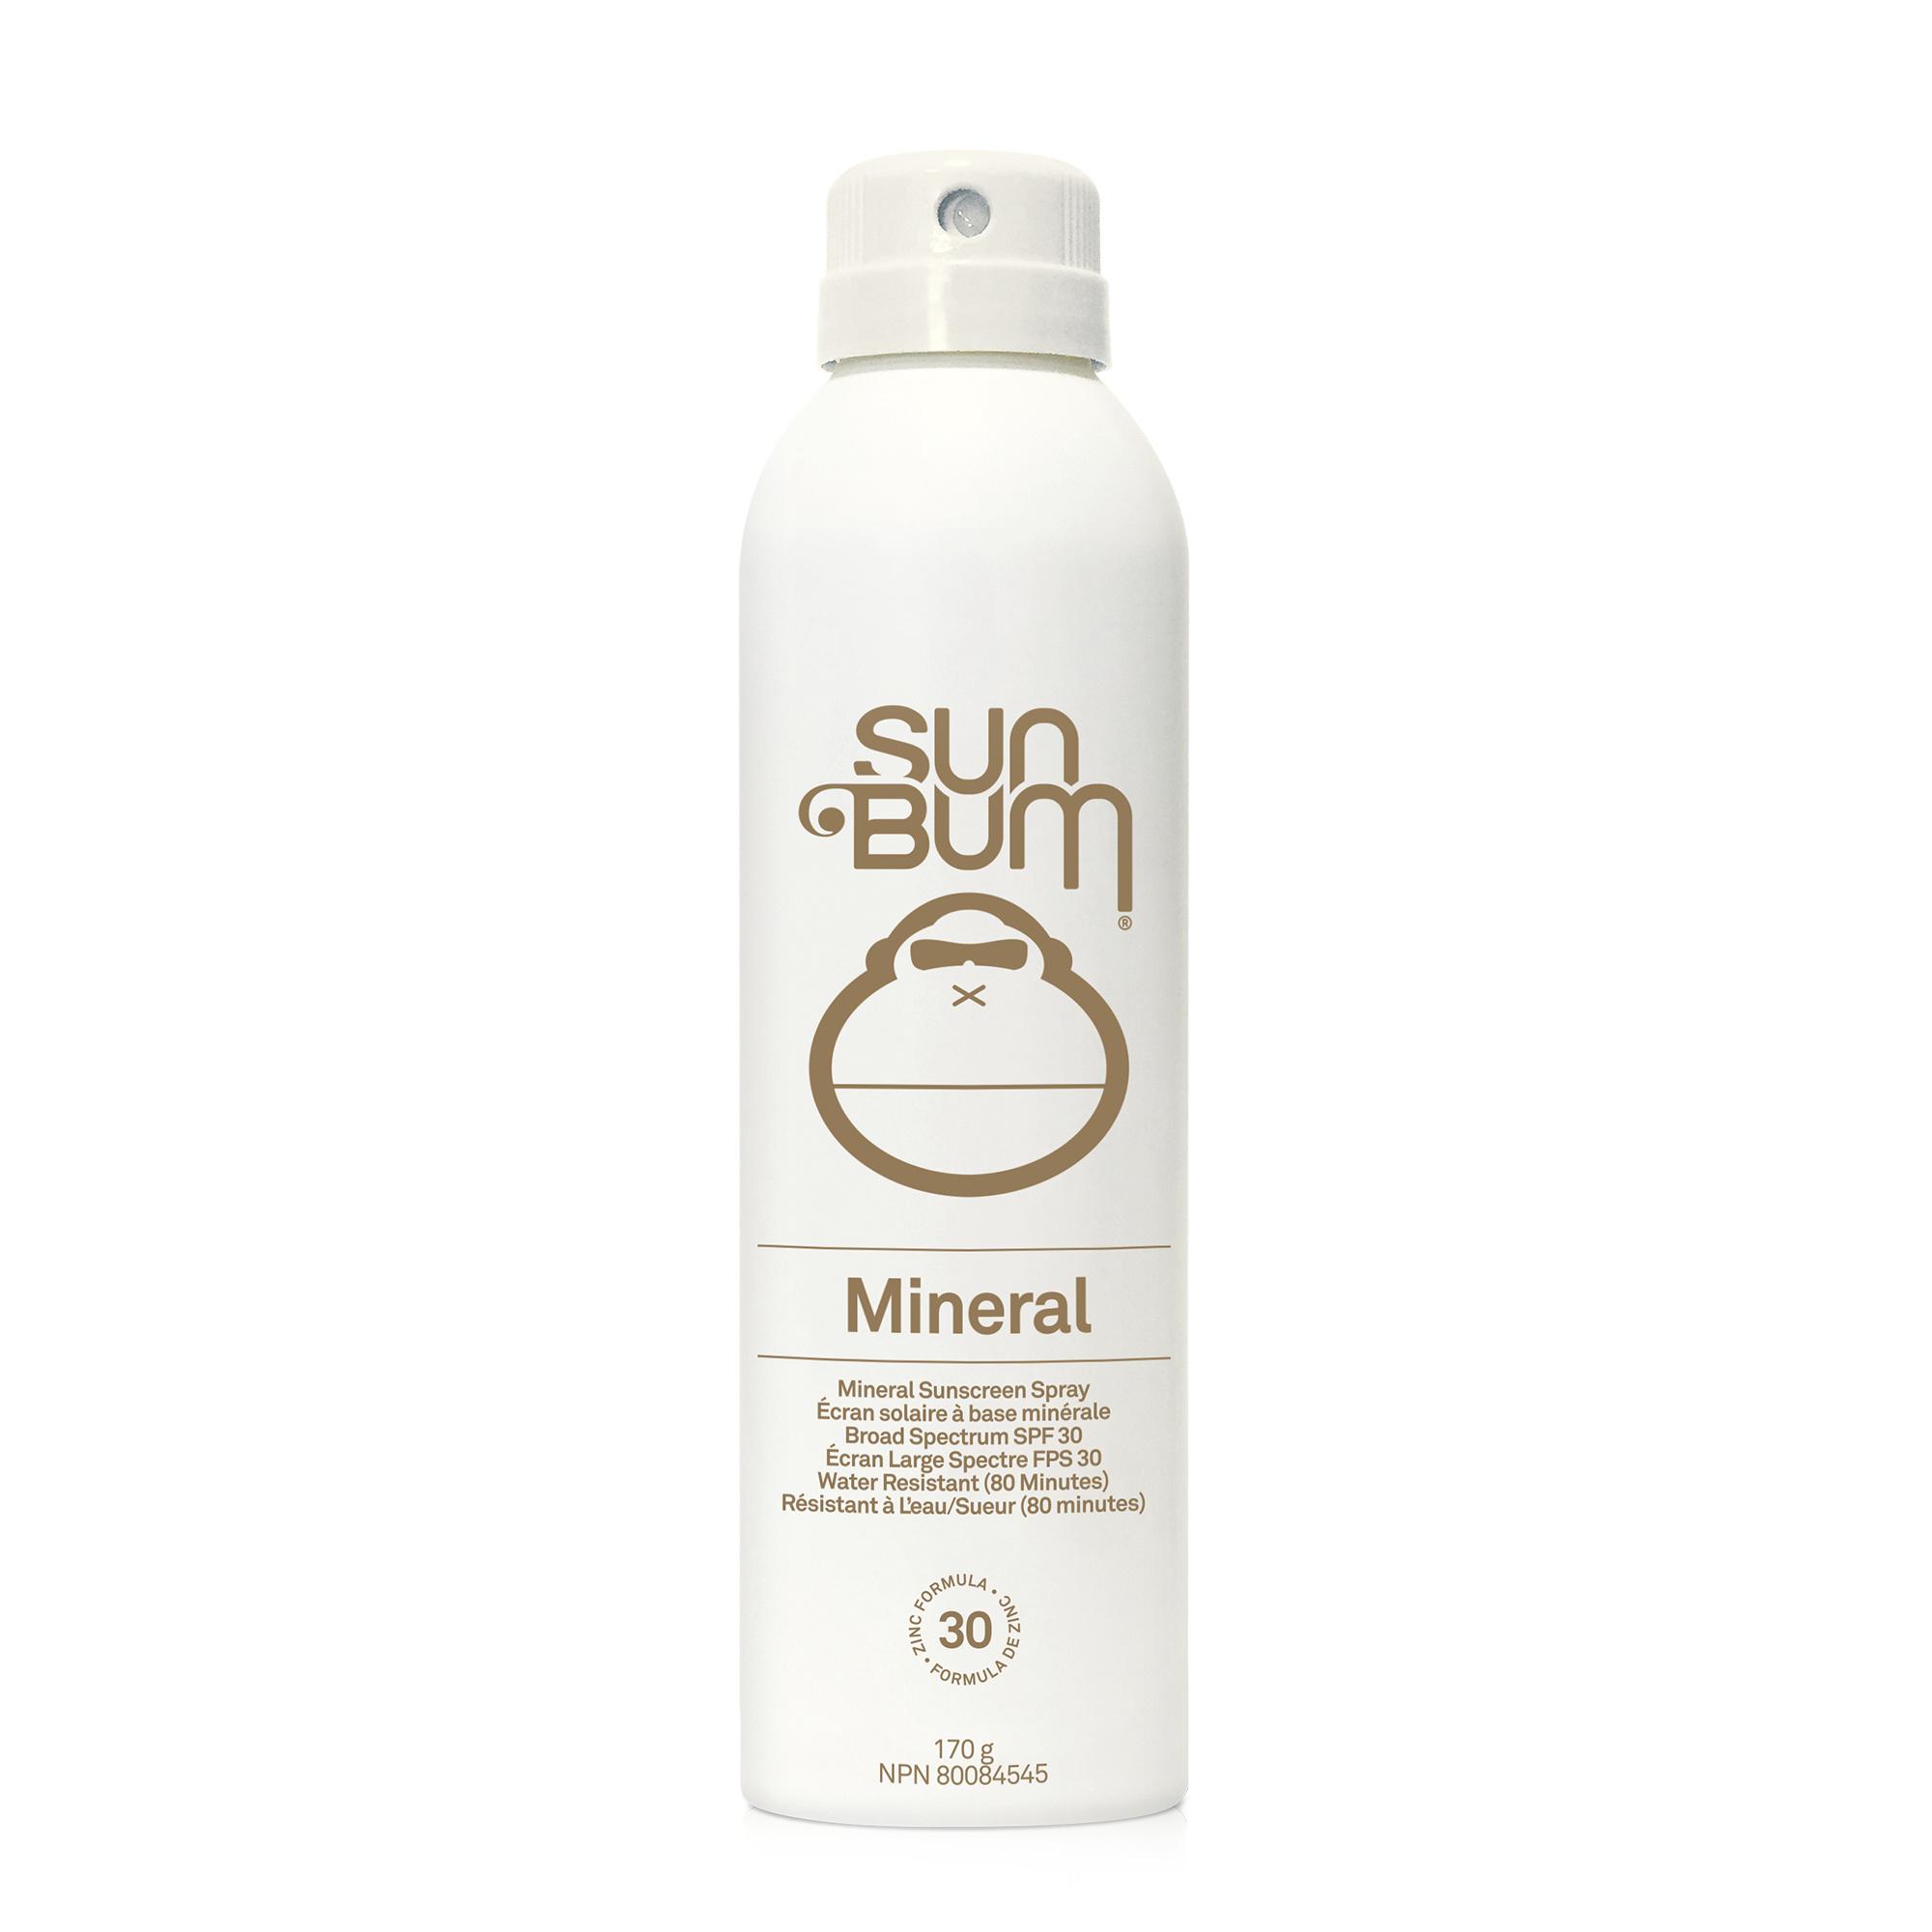 Sun Bum SunBum - Mineral SPF 30 Spray